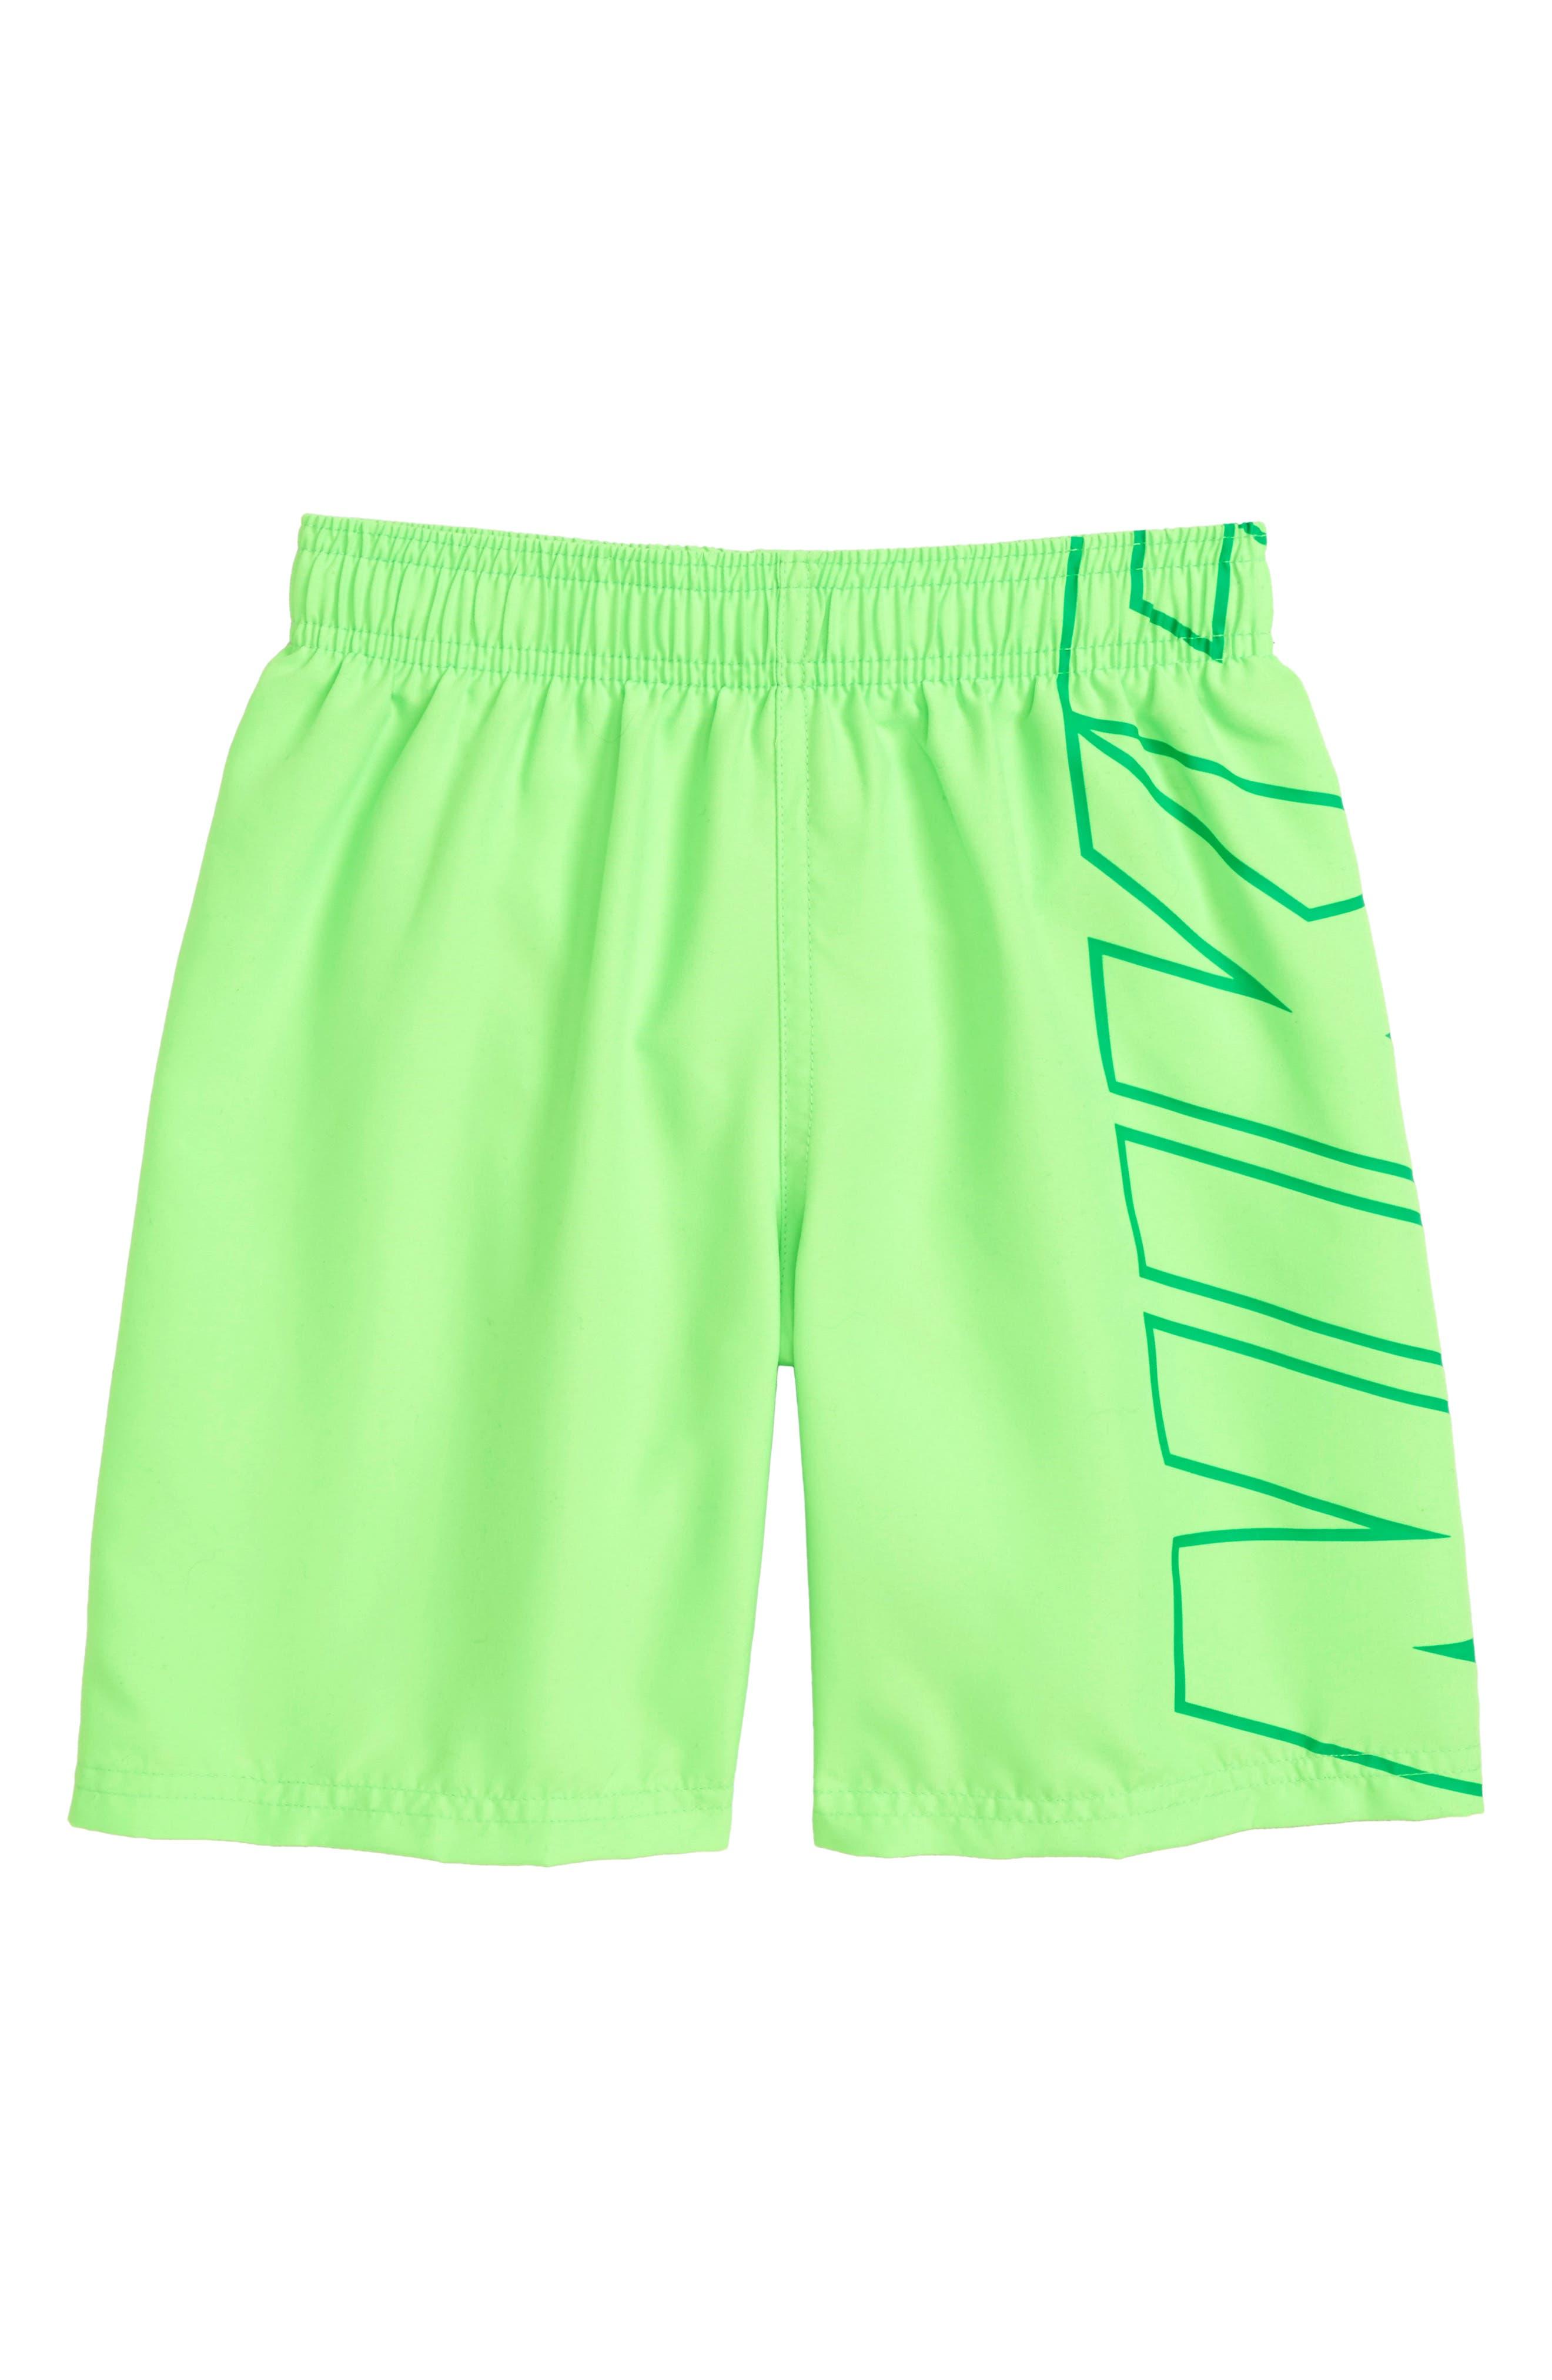 Breaker Board Shorts,                             Main thumbnail 1, color,                             370